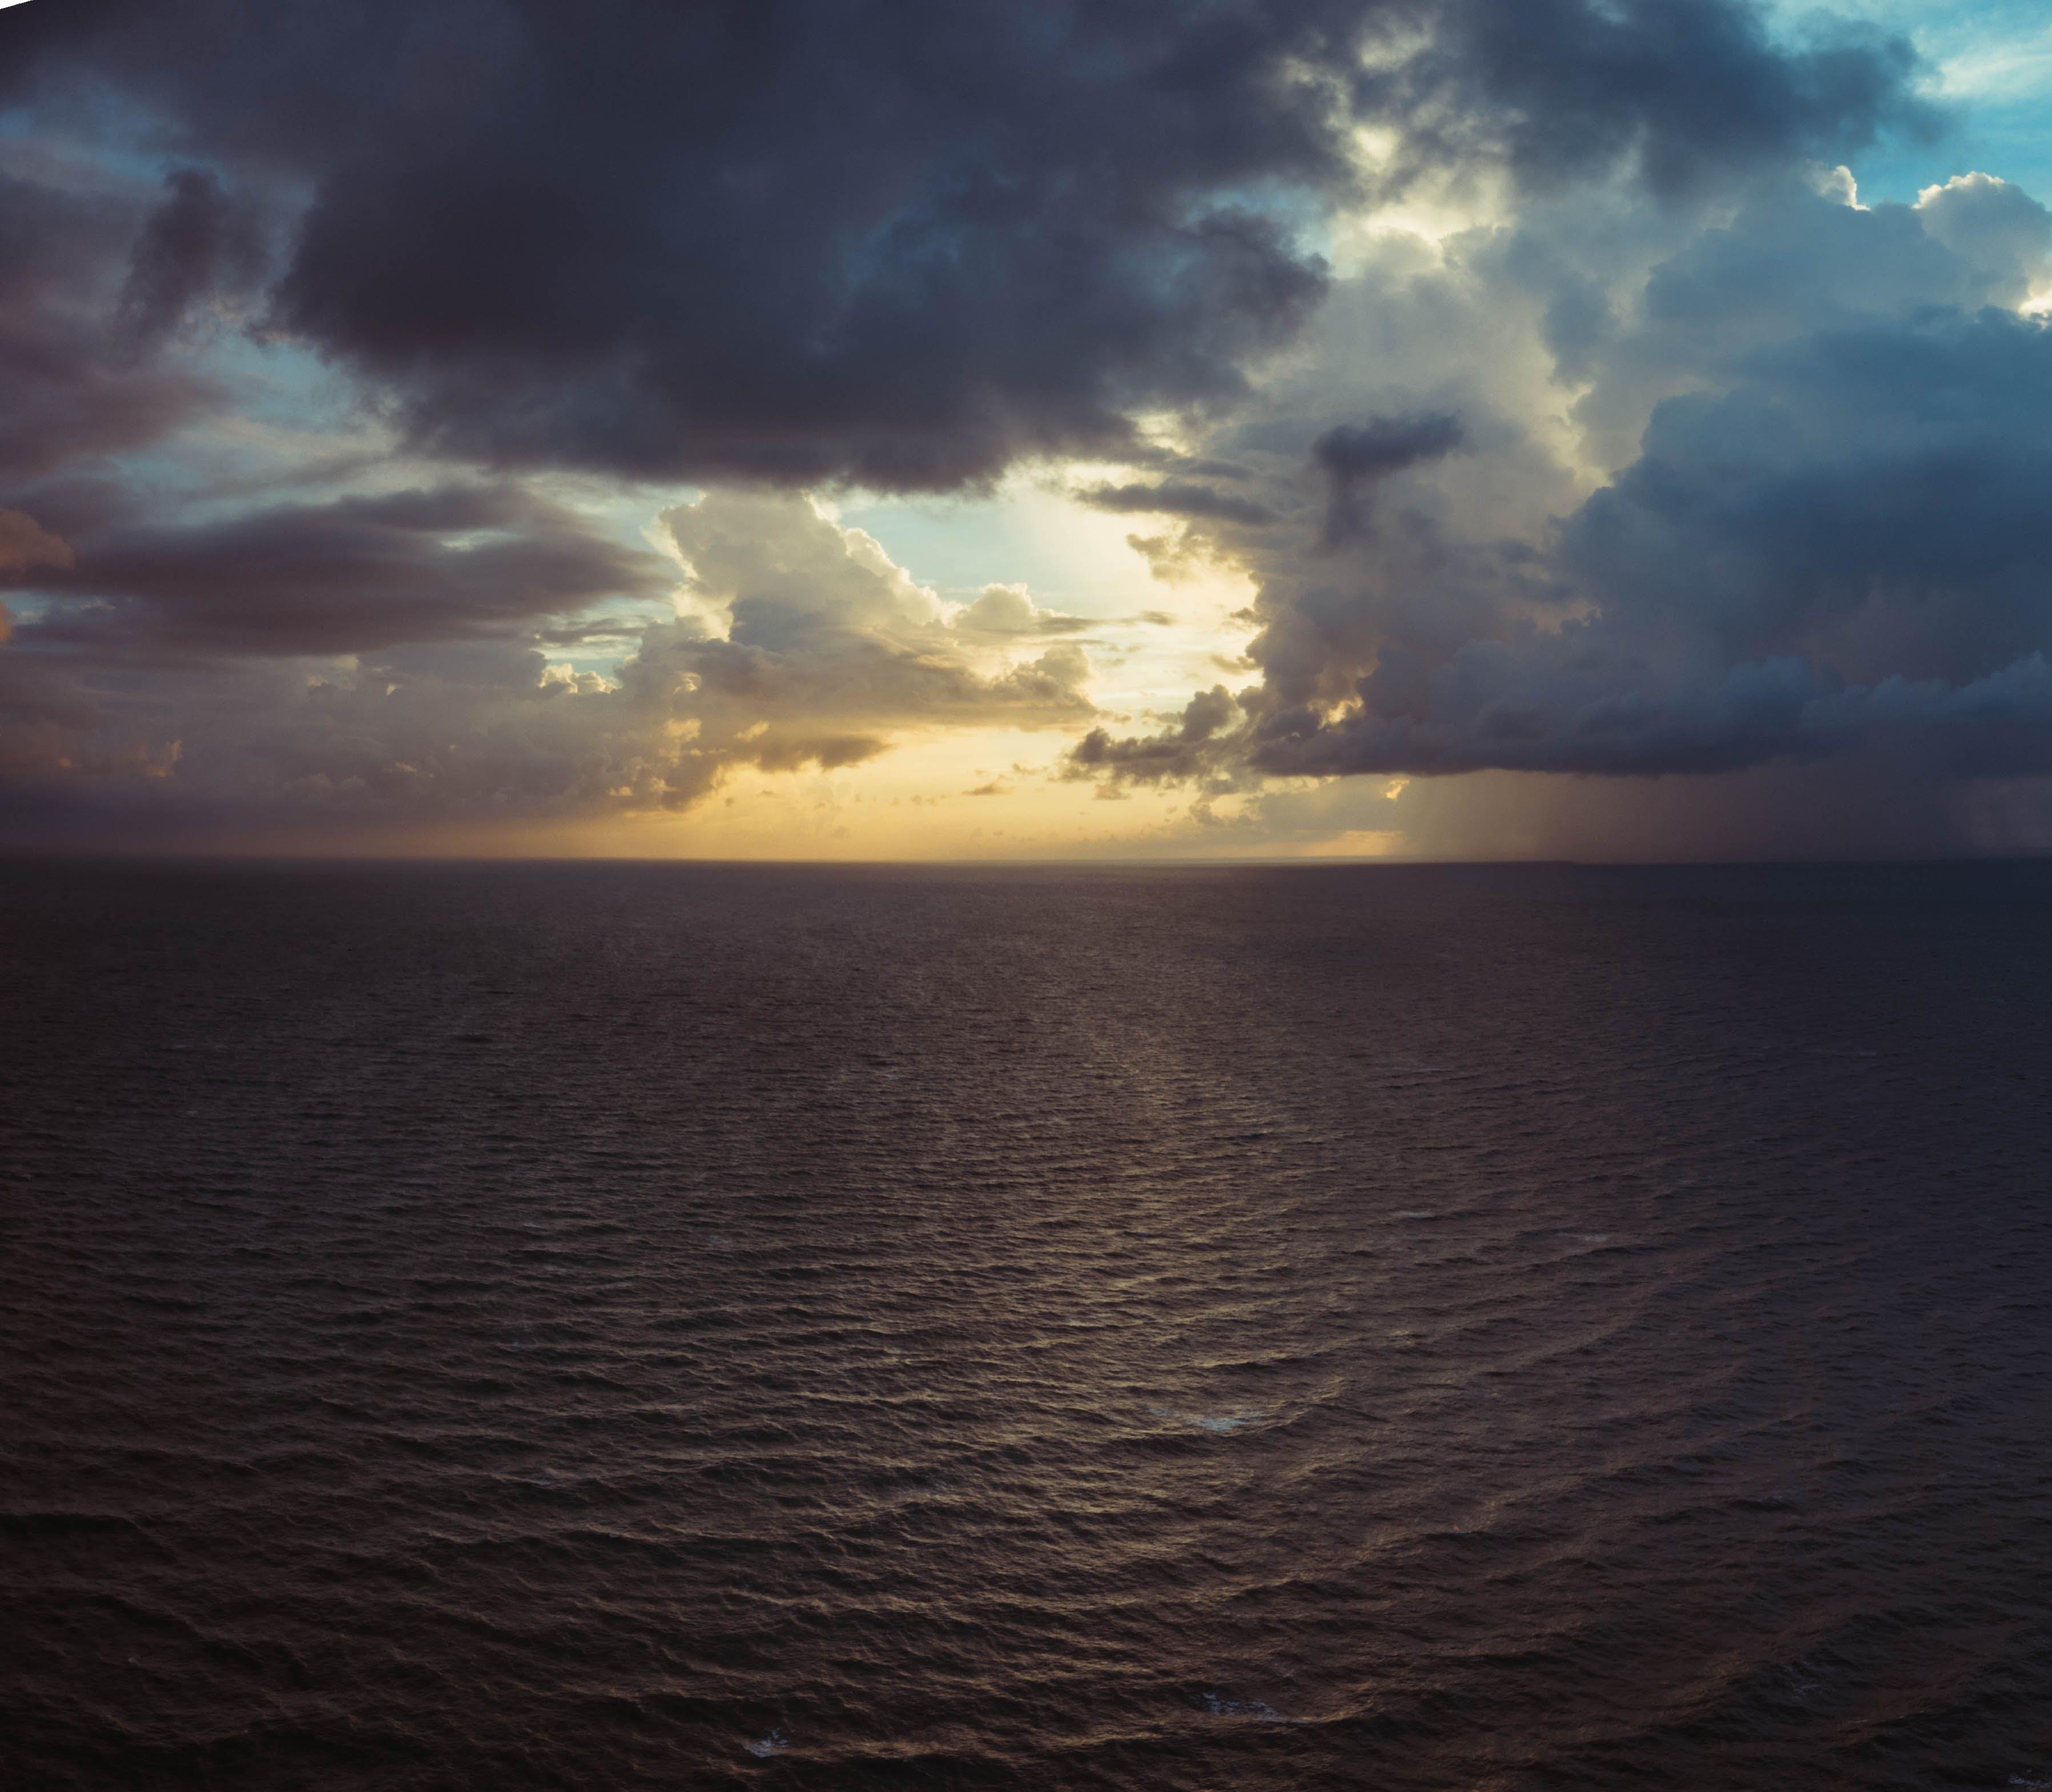 beach, bird's eye view, clouds